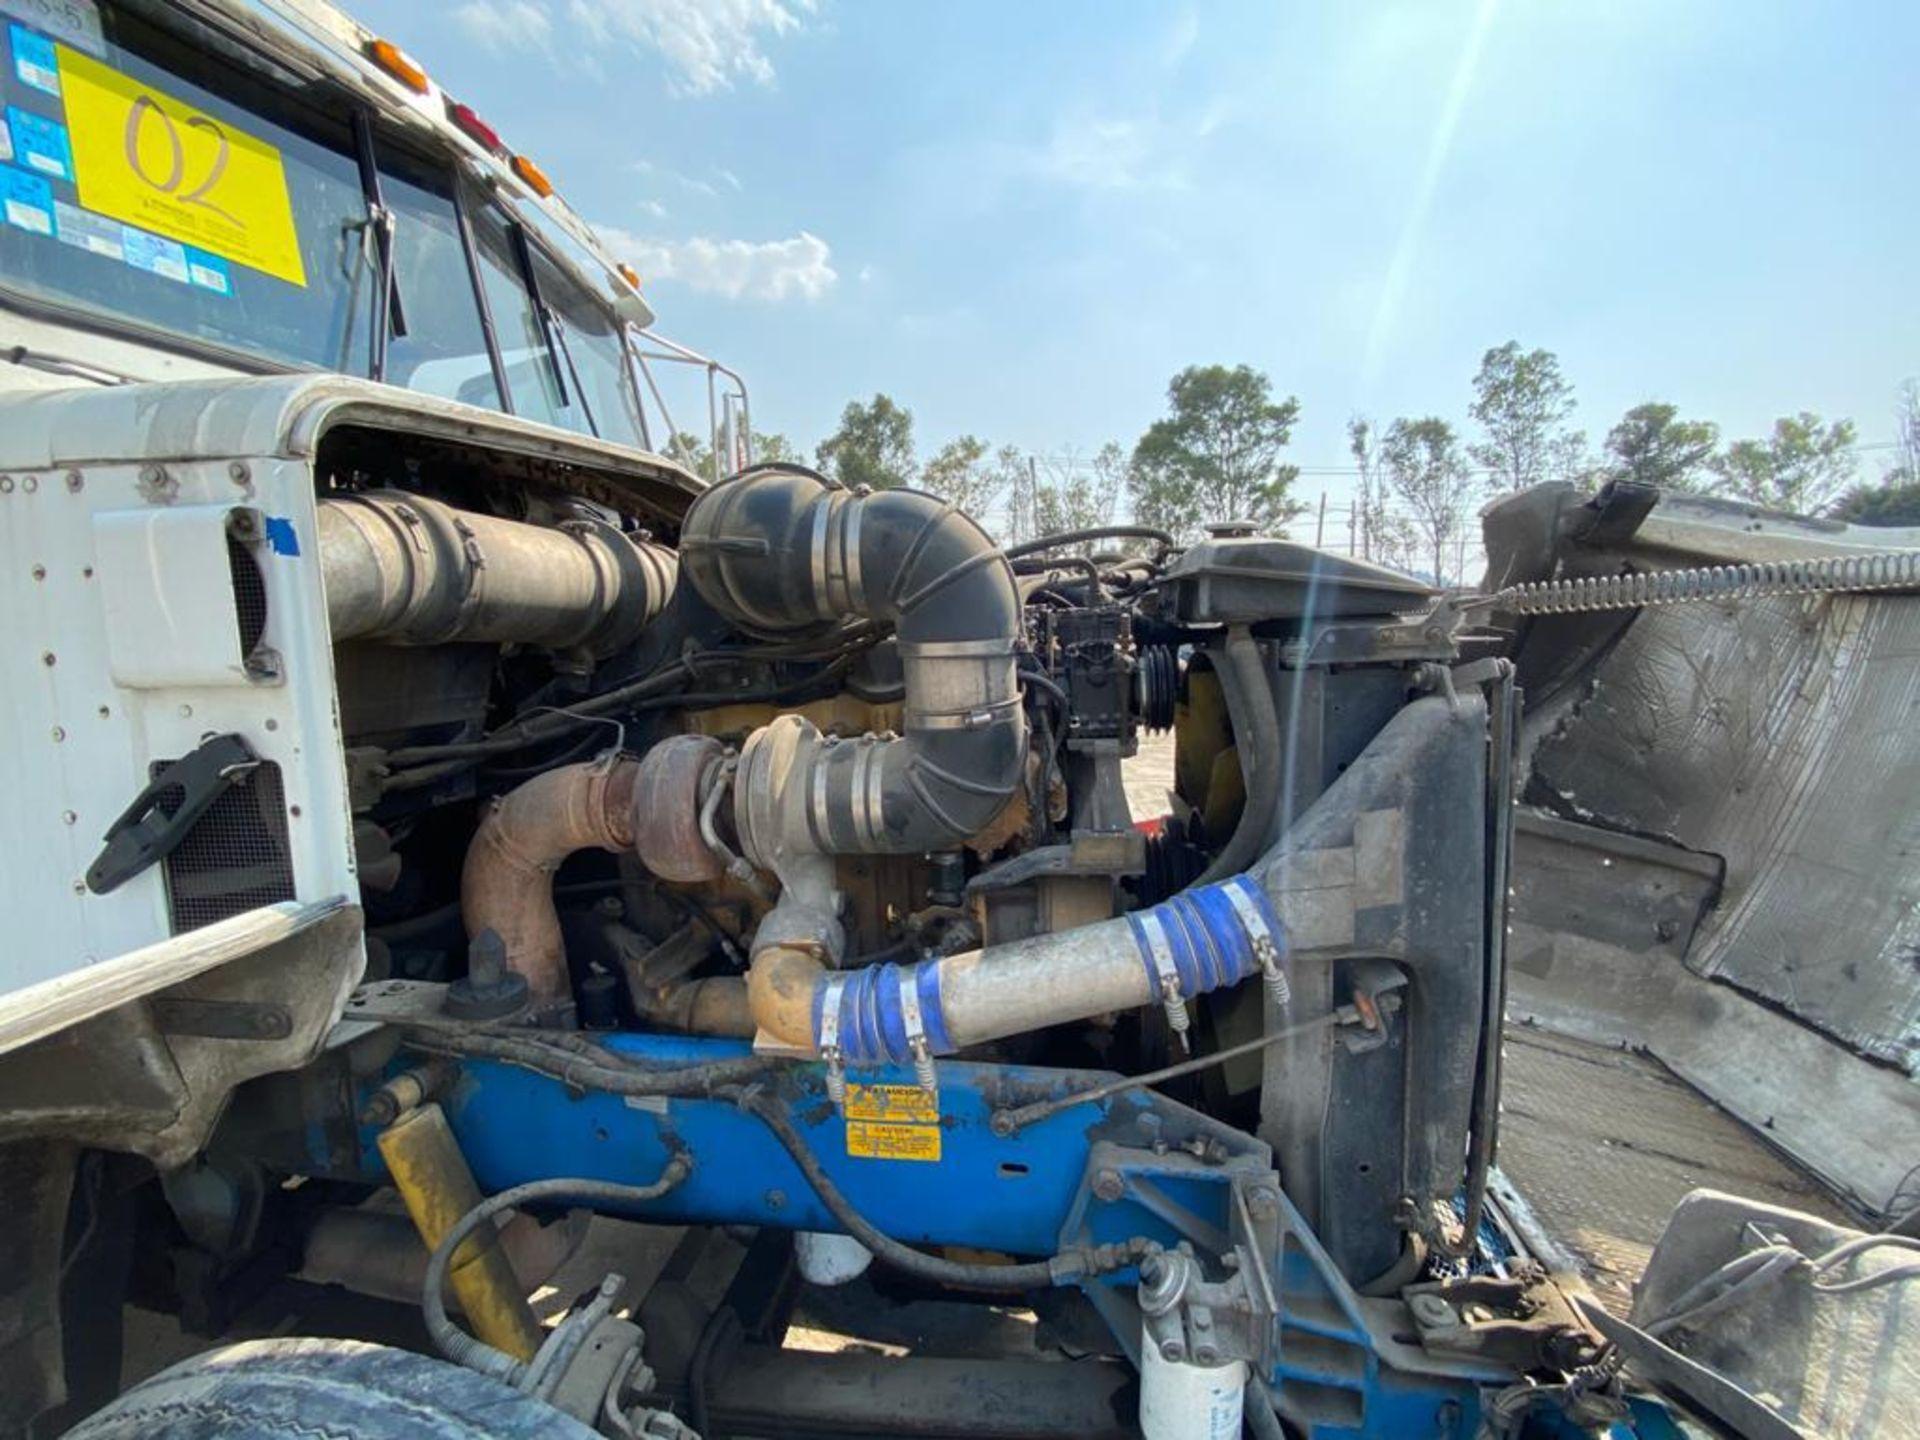 1999 Kenworth Sleeper truck tractor, standard transmission of 18 speeds - Image 75 of 75